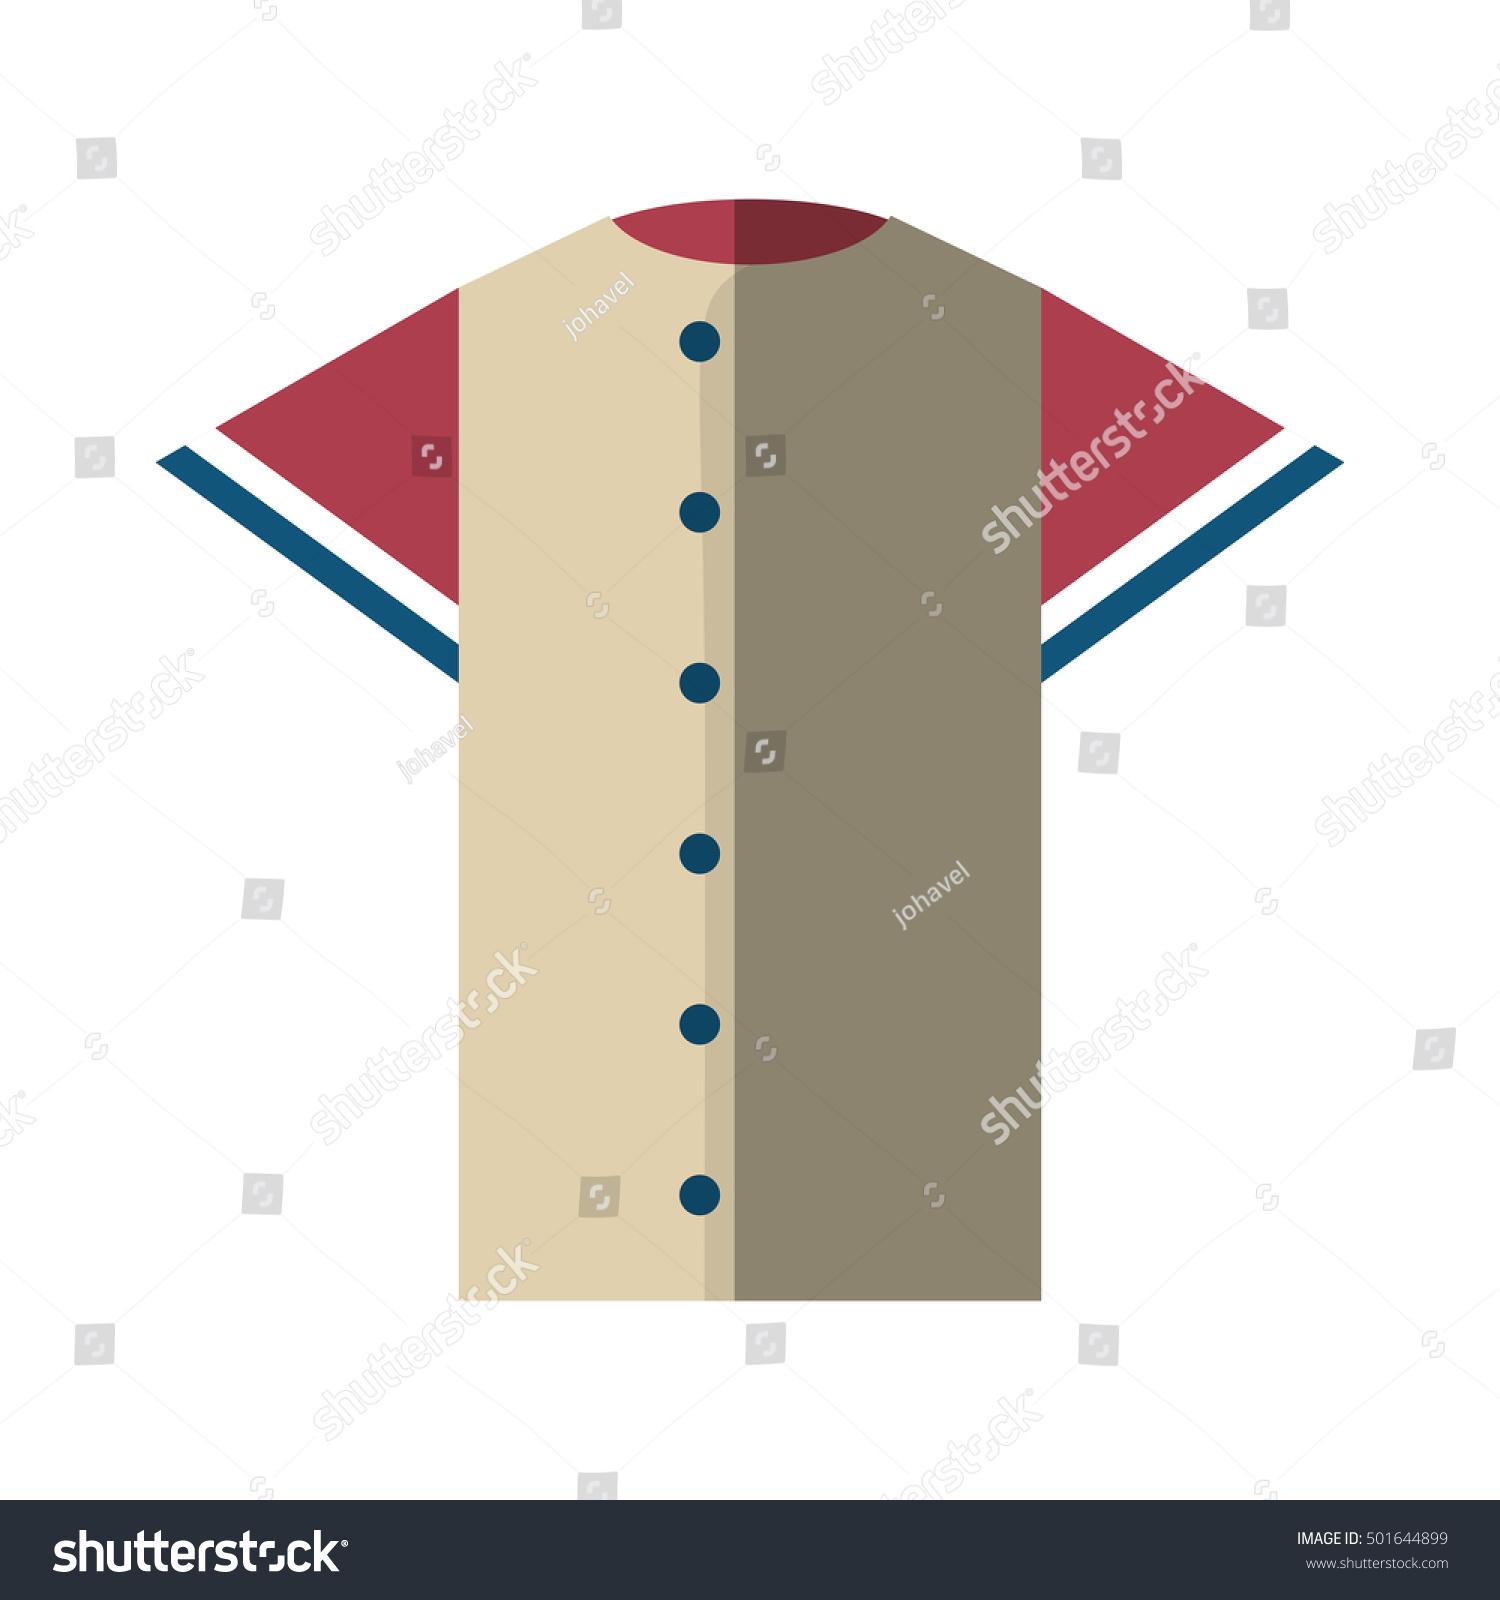 Shirt uniform design vector - Shirt Uniform Baseball Team Icon Vector Illustration Design